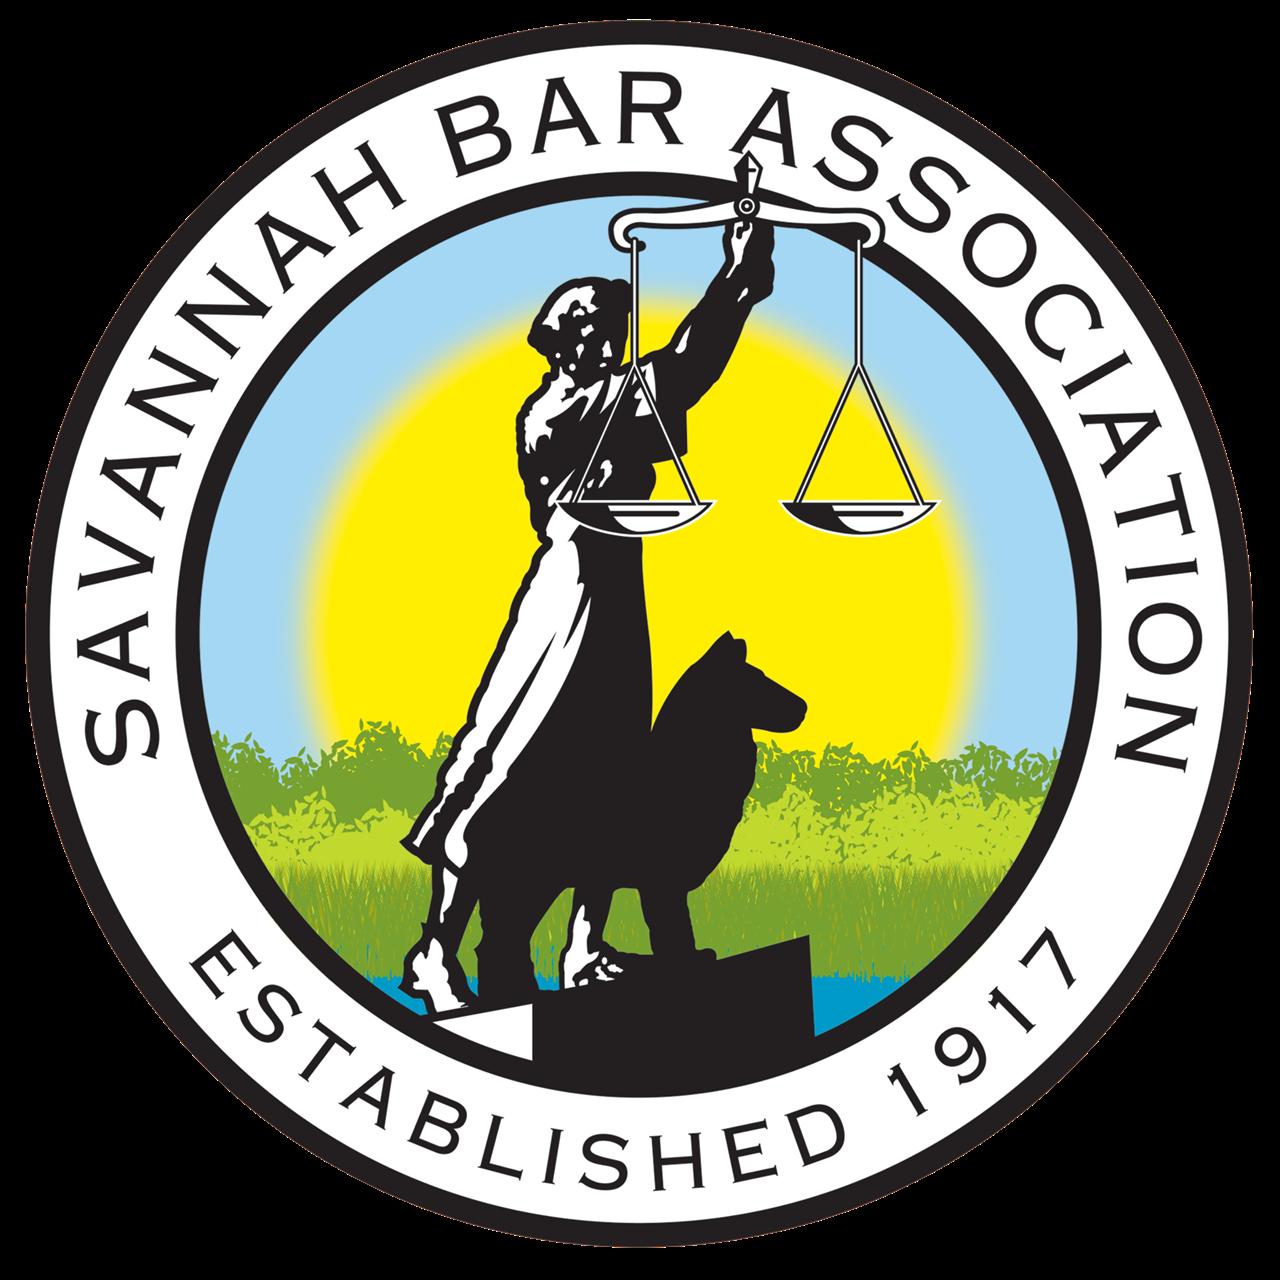 Lawyer clipart international law. History of savannah bar